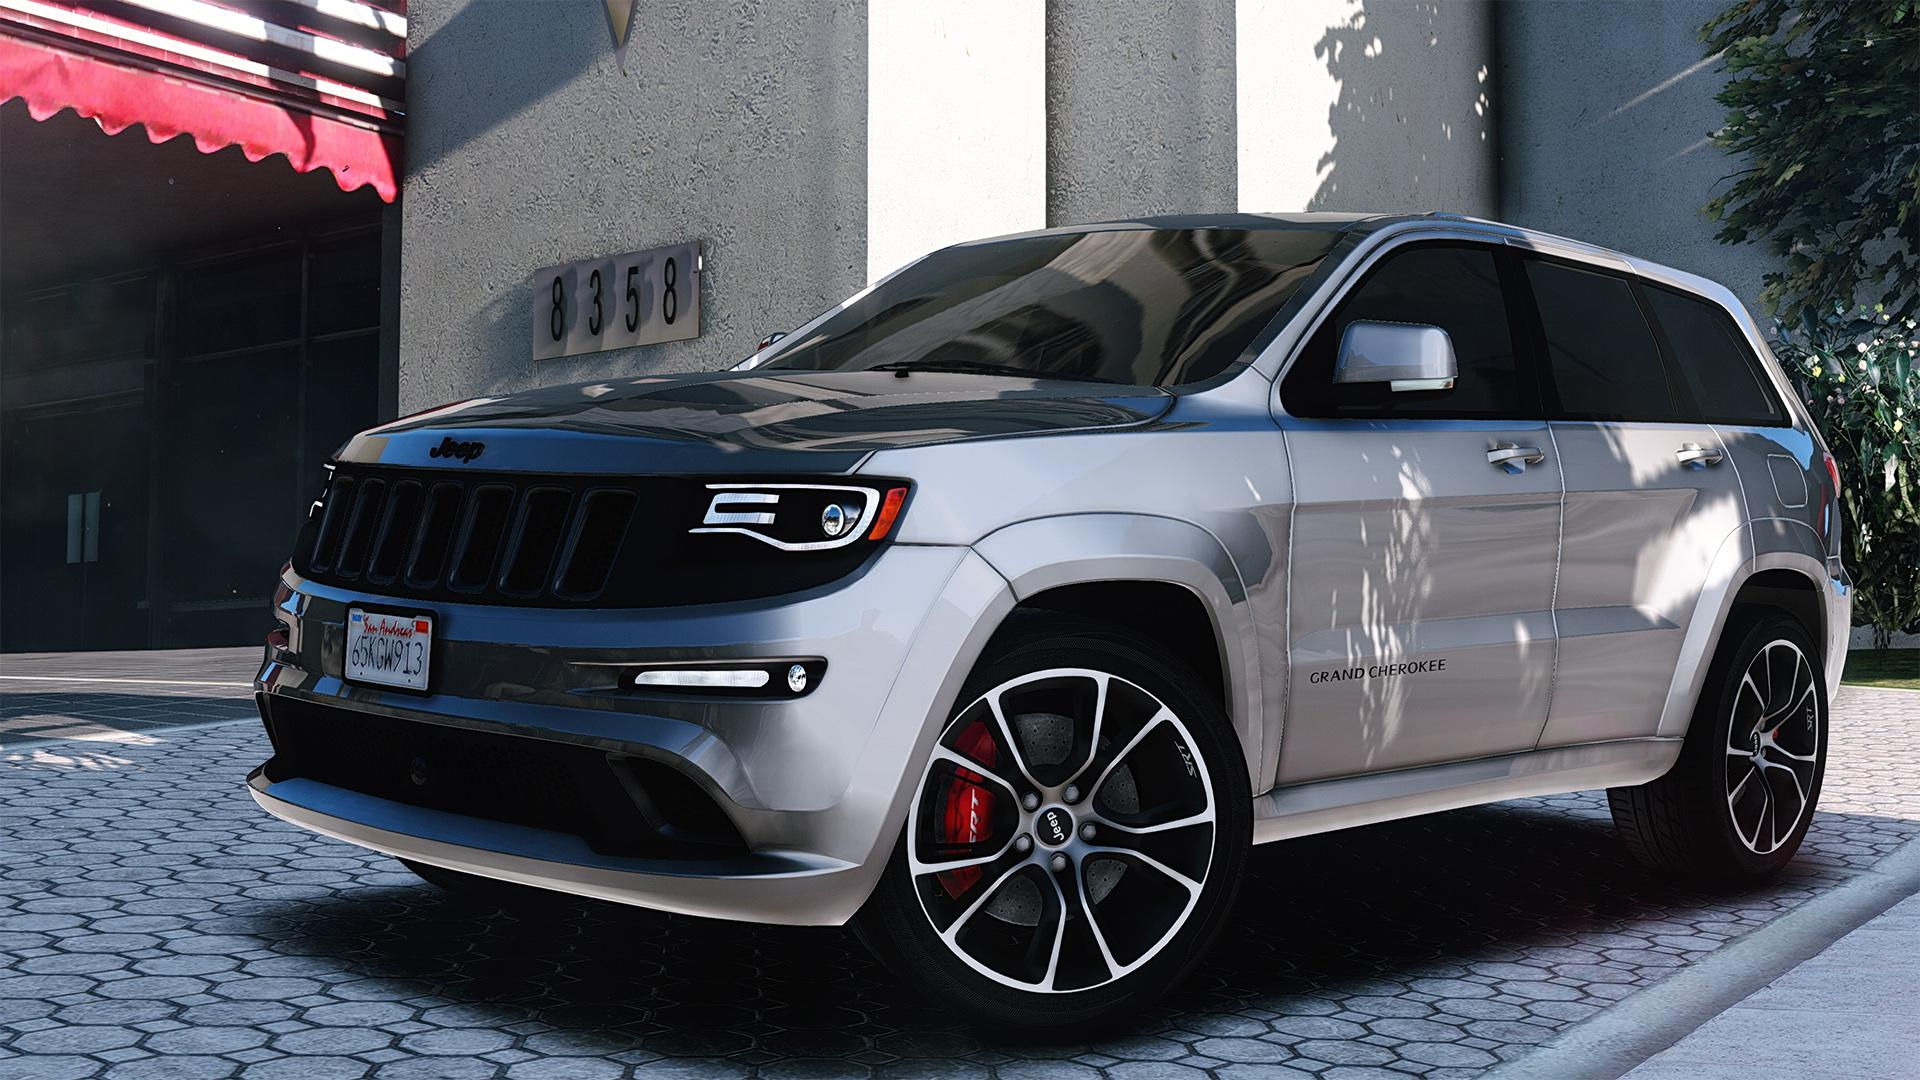 Black Jeep Cherokee Jeep SRT-8 2015 [Add-On] - GTA5-Mods.com